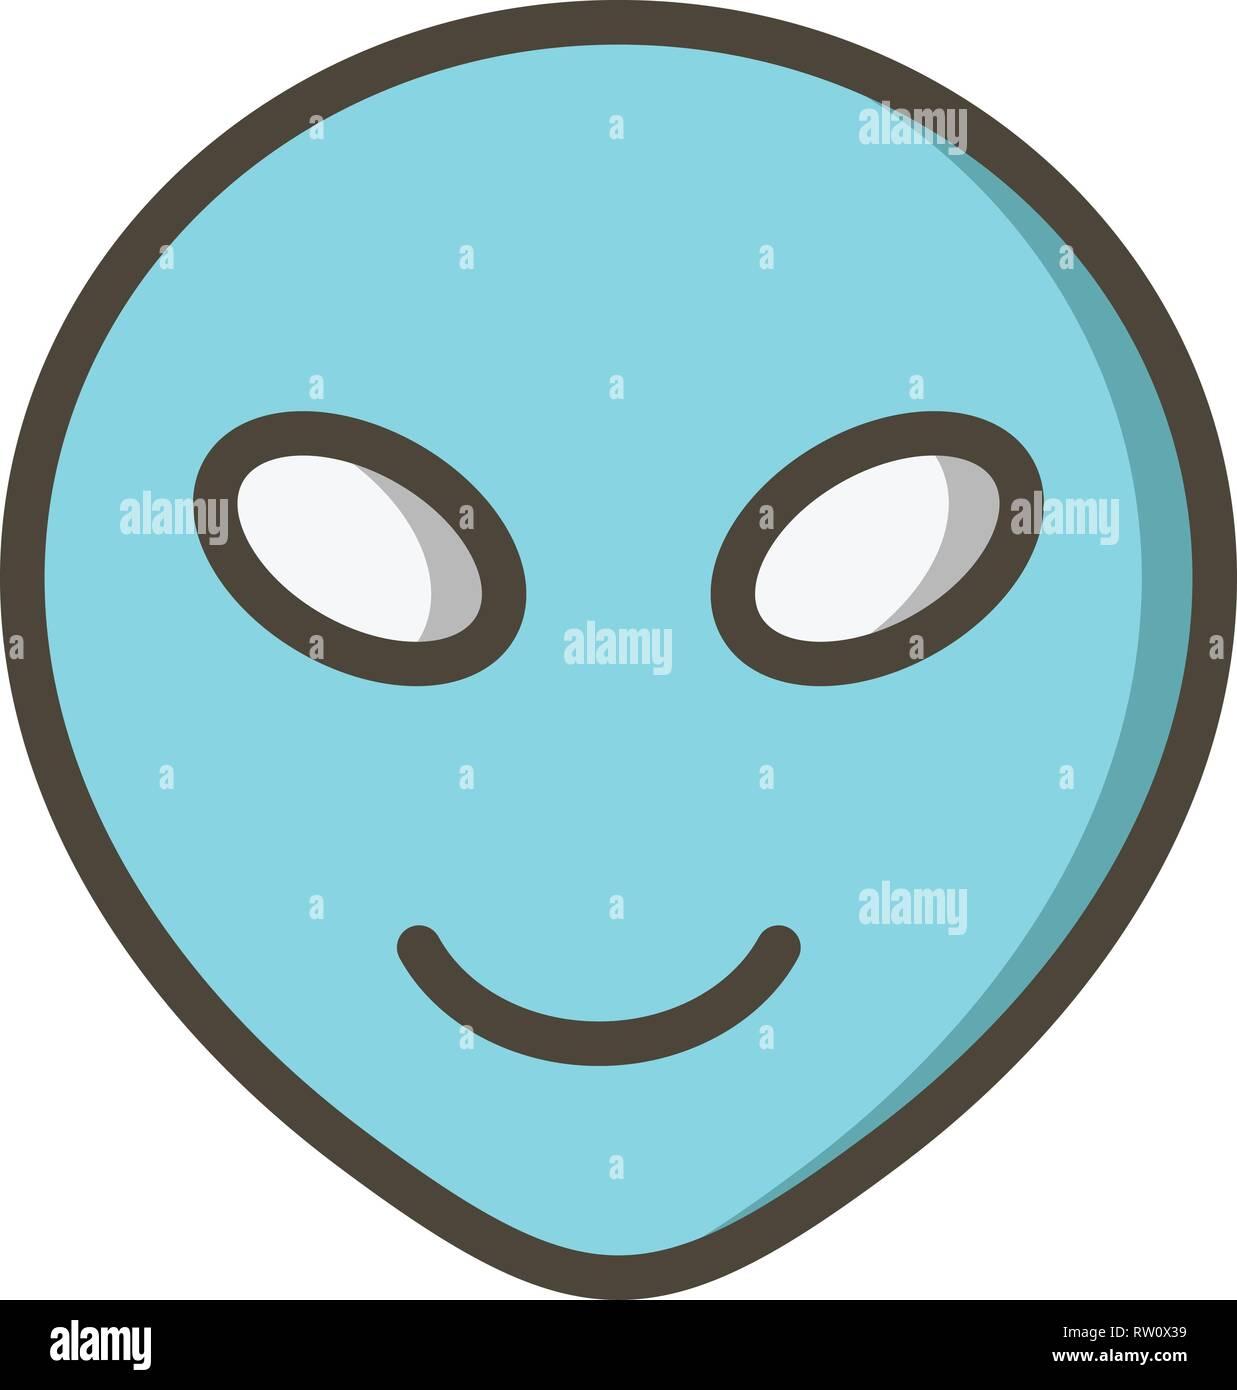 Alien Emoji Vector Icon Sign Icon Vector Illustration For